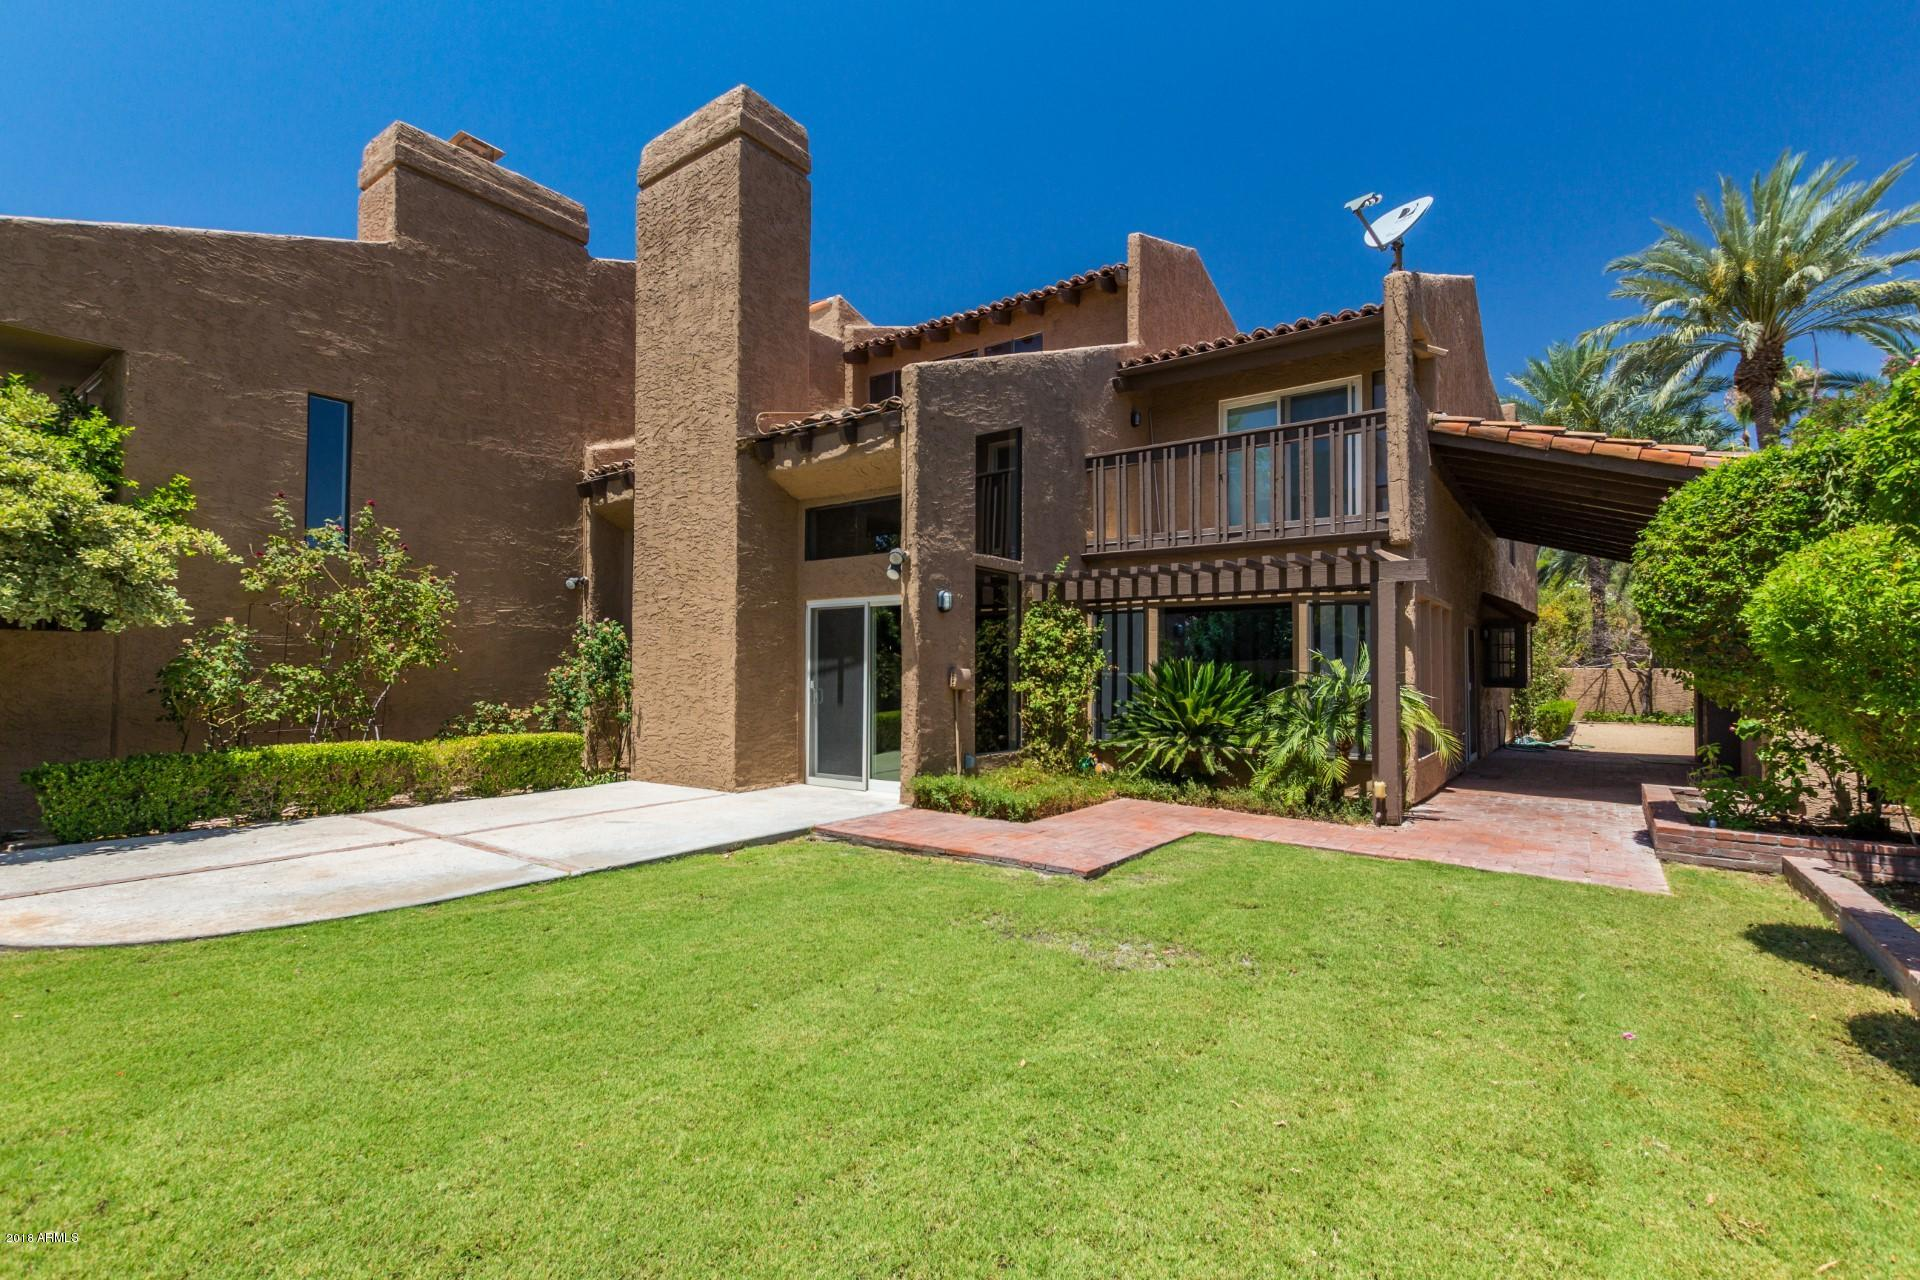 Photo of 4434 E CAMELBACK Road #141, Phoenix, AZ 85018